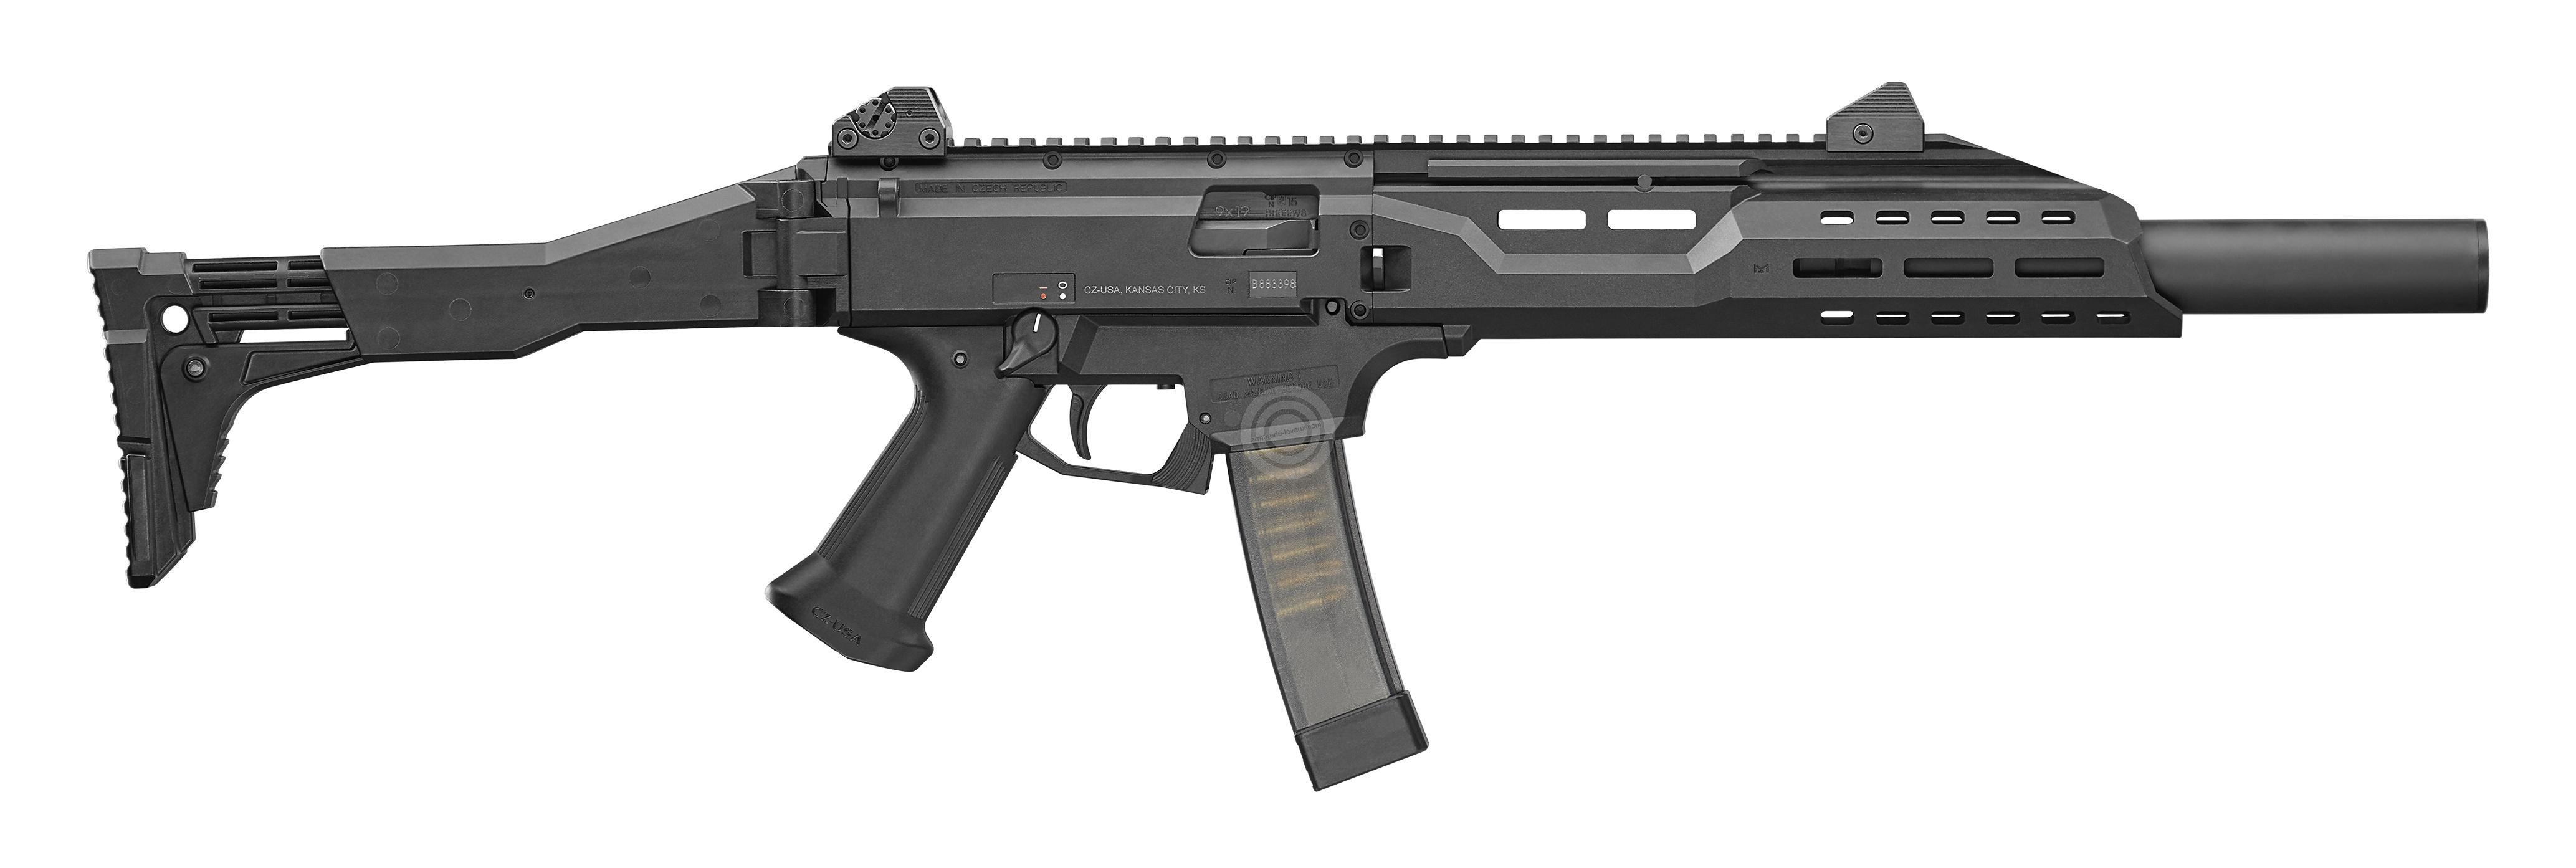 CZ SCORPION EVO 3 S1 Carbine cal.9x19